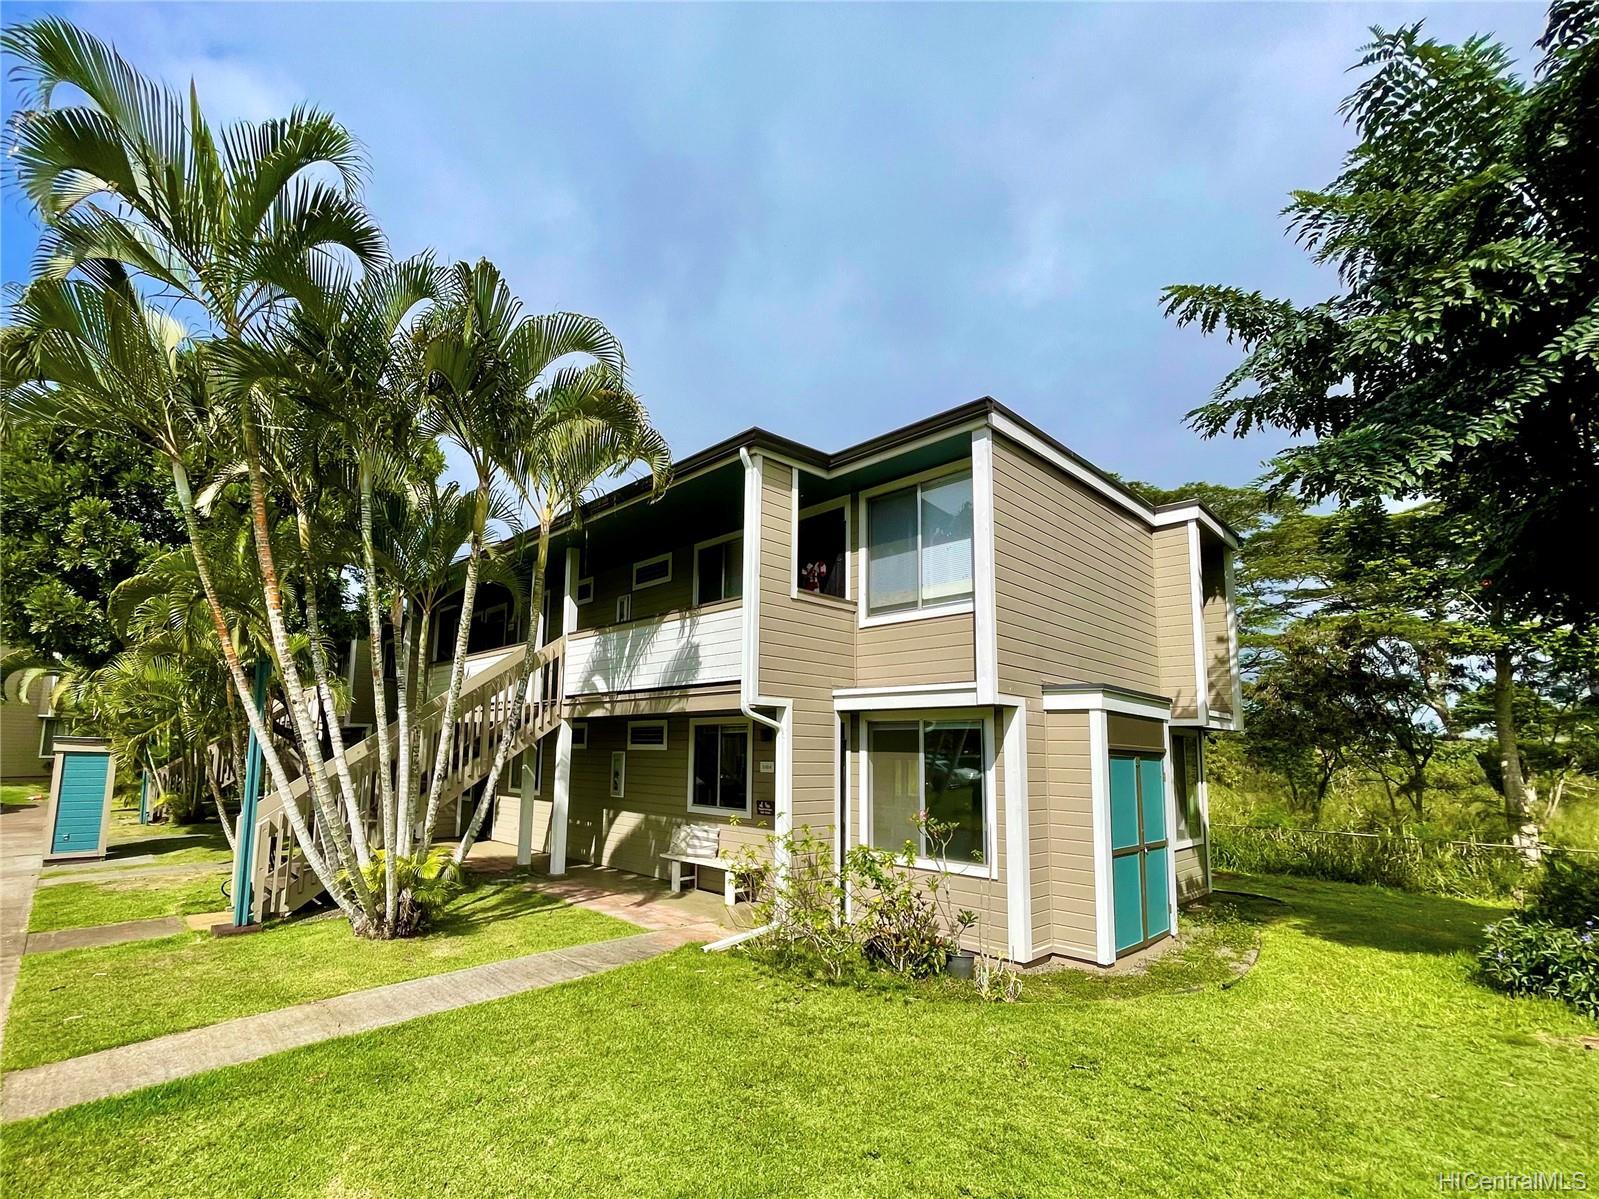 95-713 Lanikuhana Ave townhouse # Q104, Mililani, Hawaii - photo 13 of 15